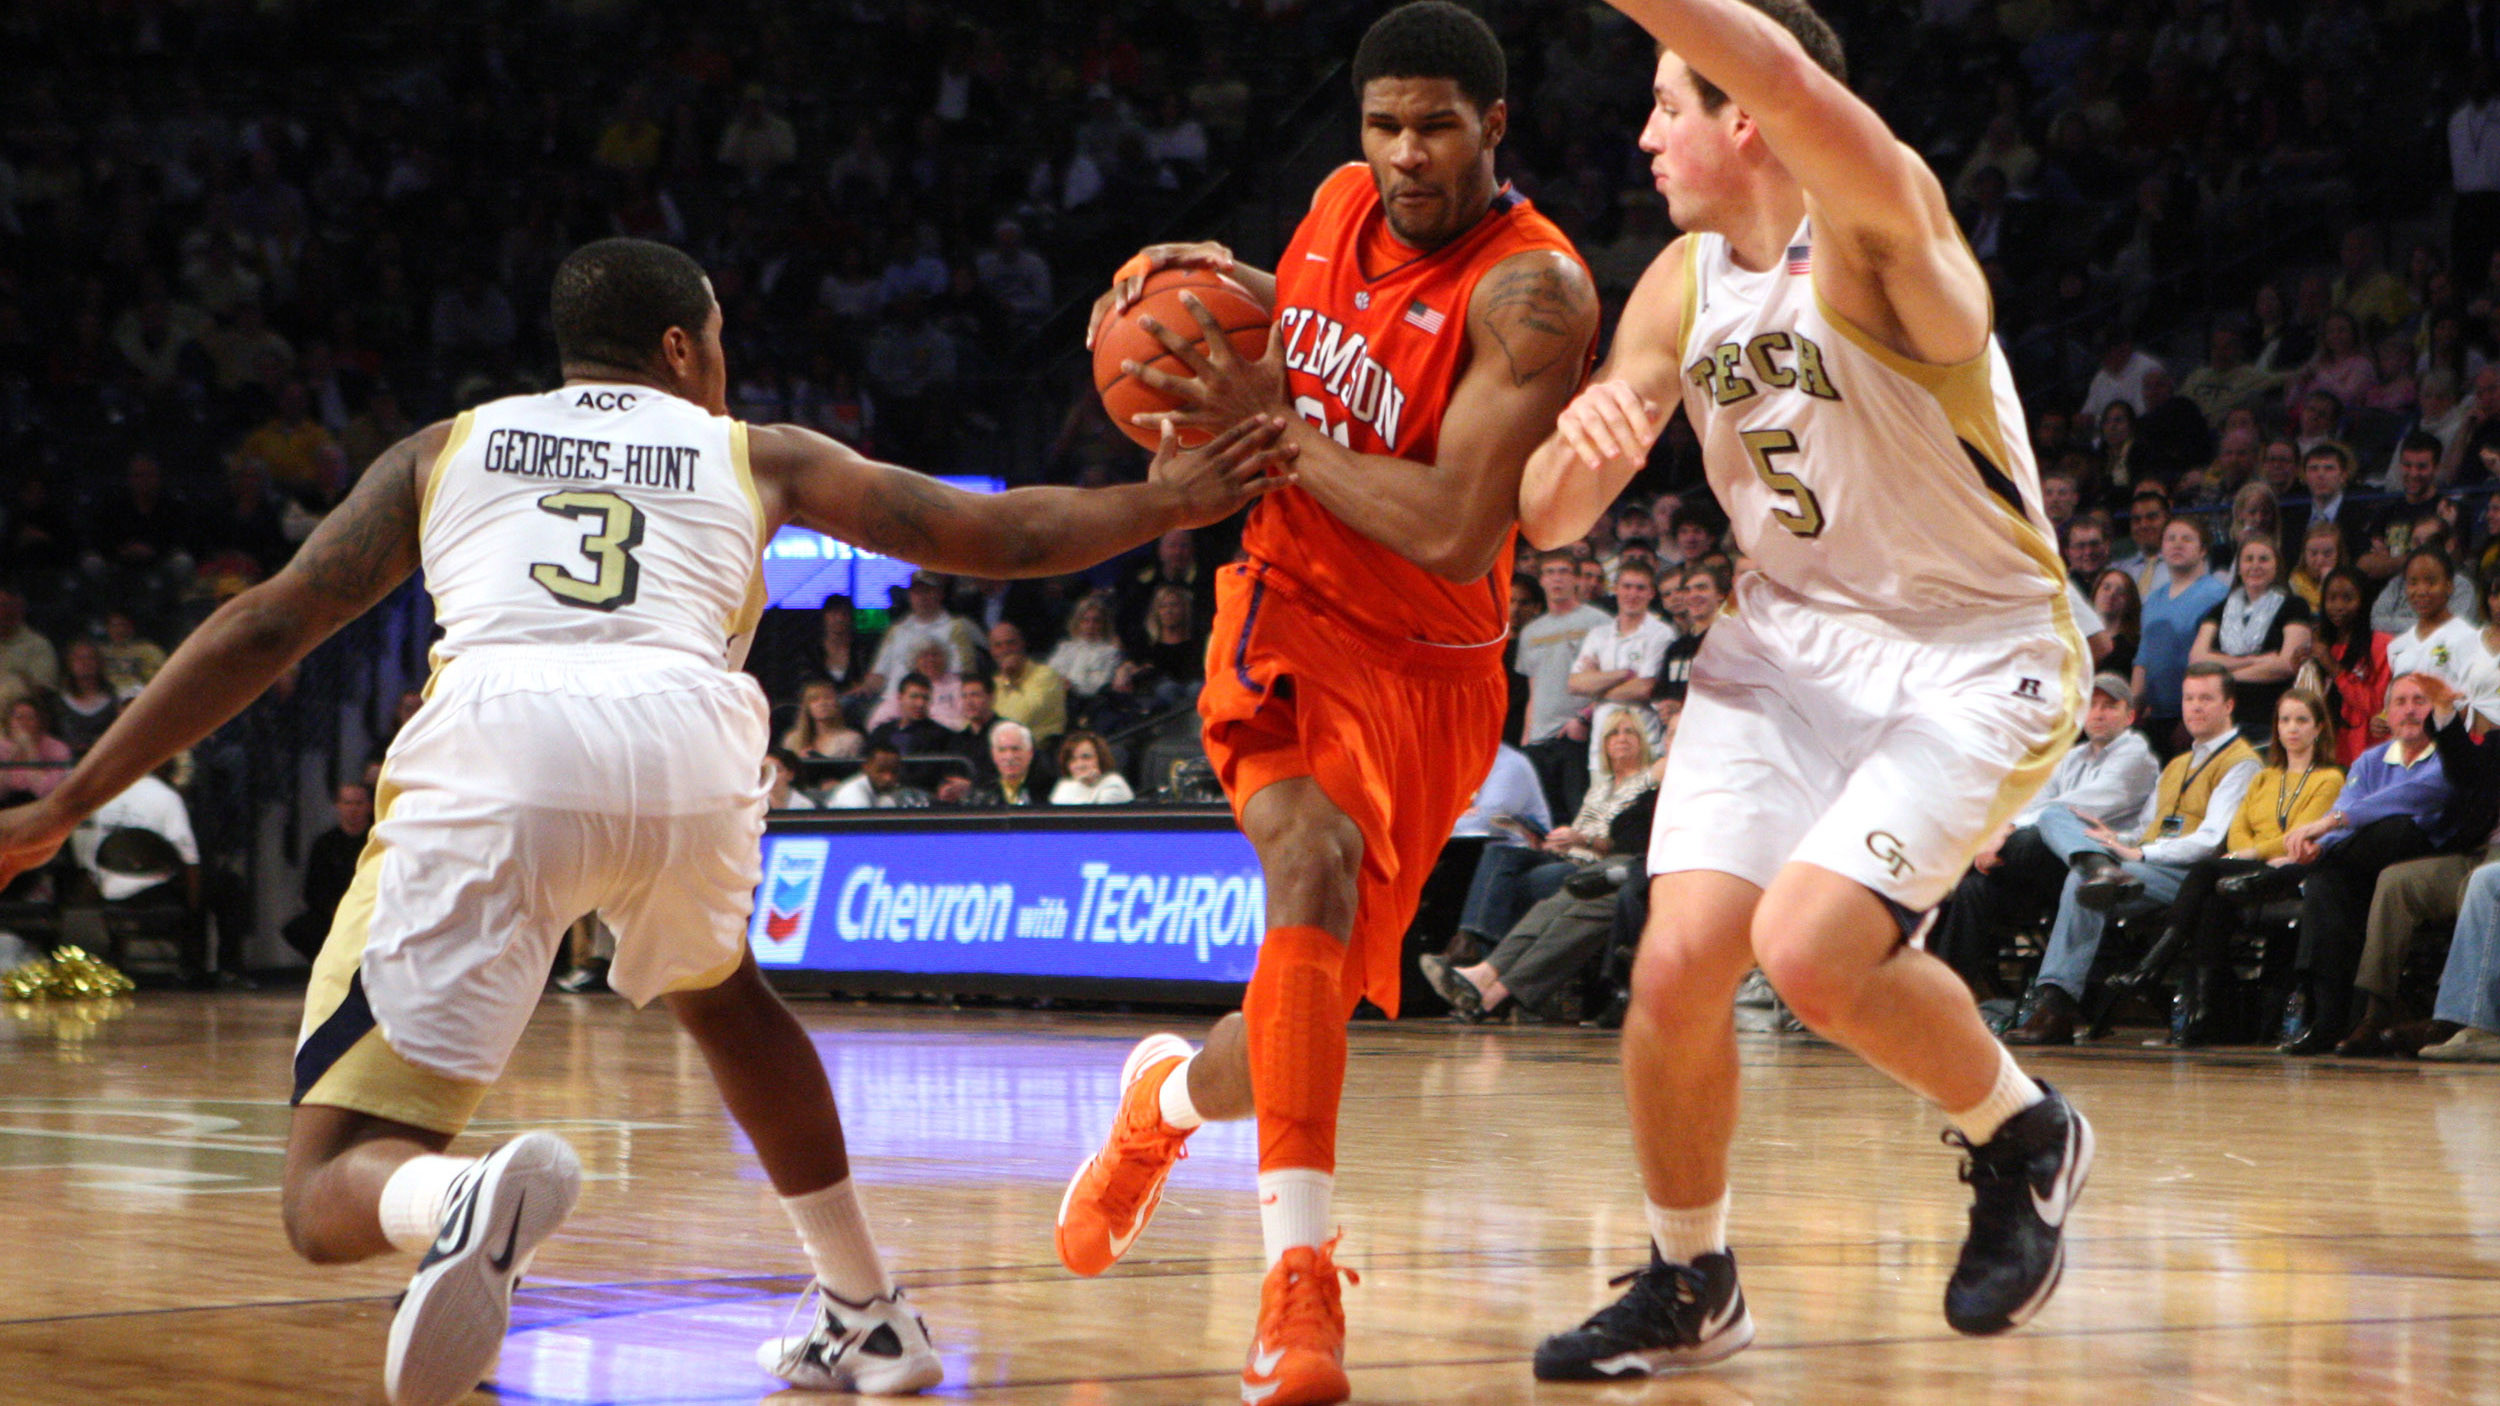 Tigers to Play Host to #3/4 Miami Sunday Night